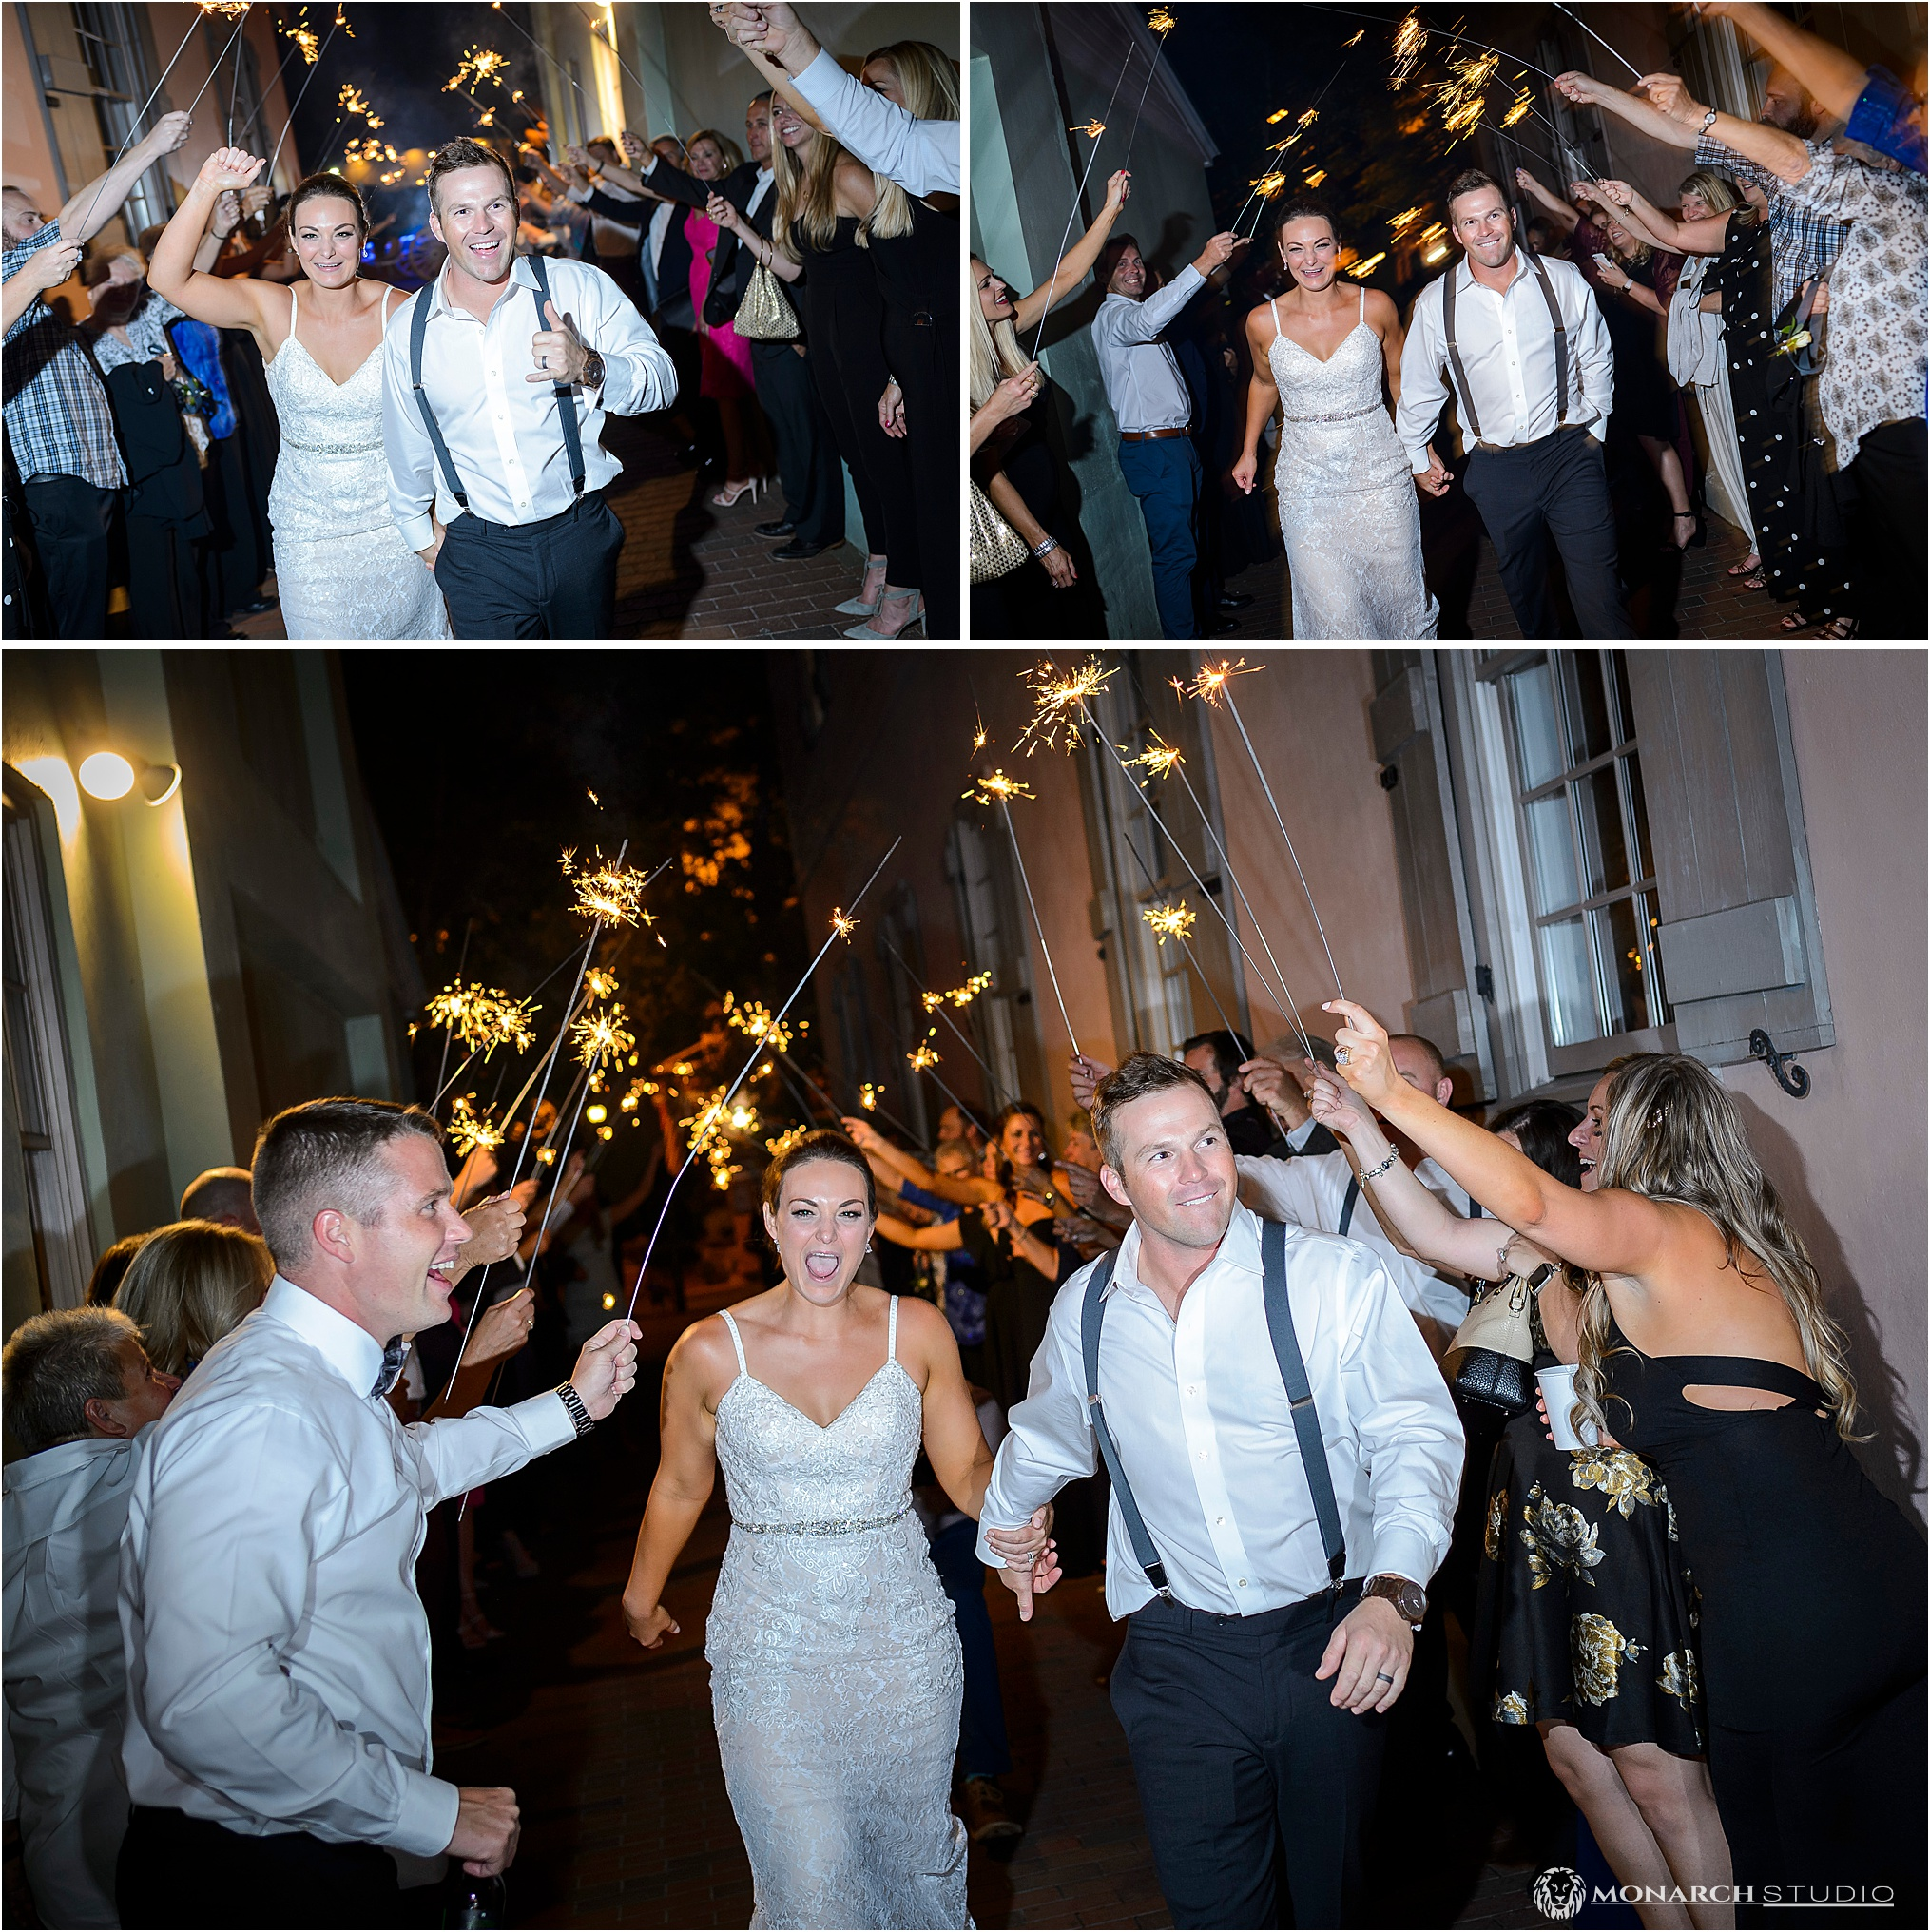 123-whiteroom-wedding-photographer-2019-05-22_0105.jpg